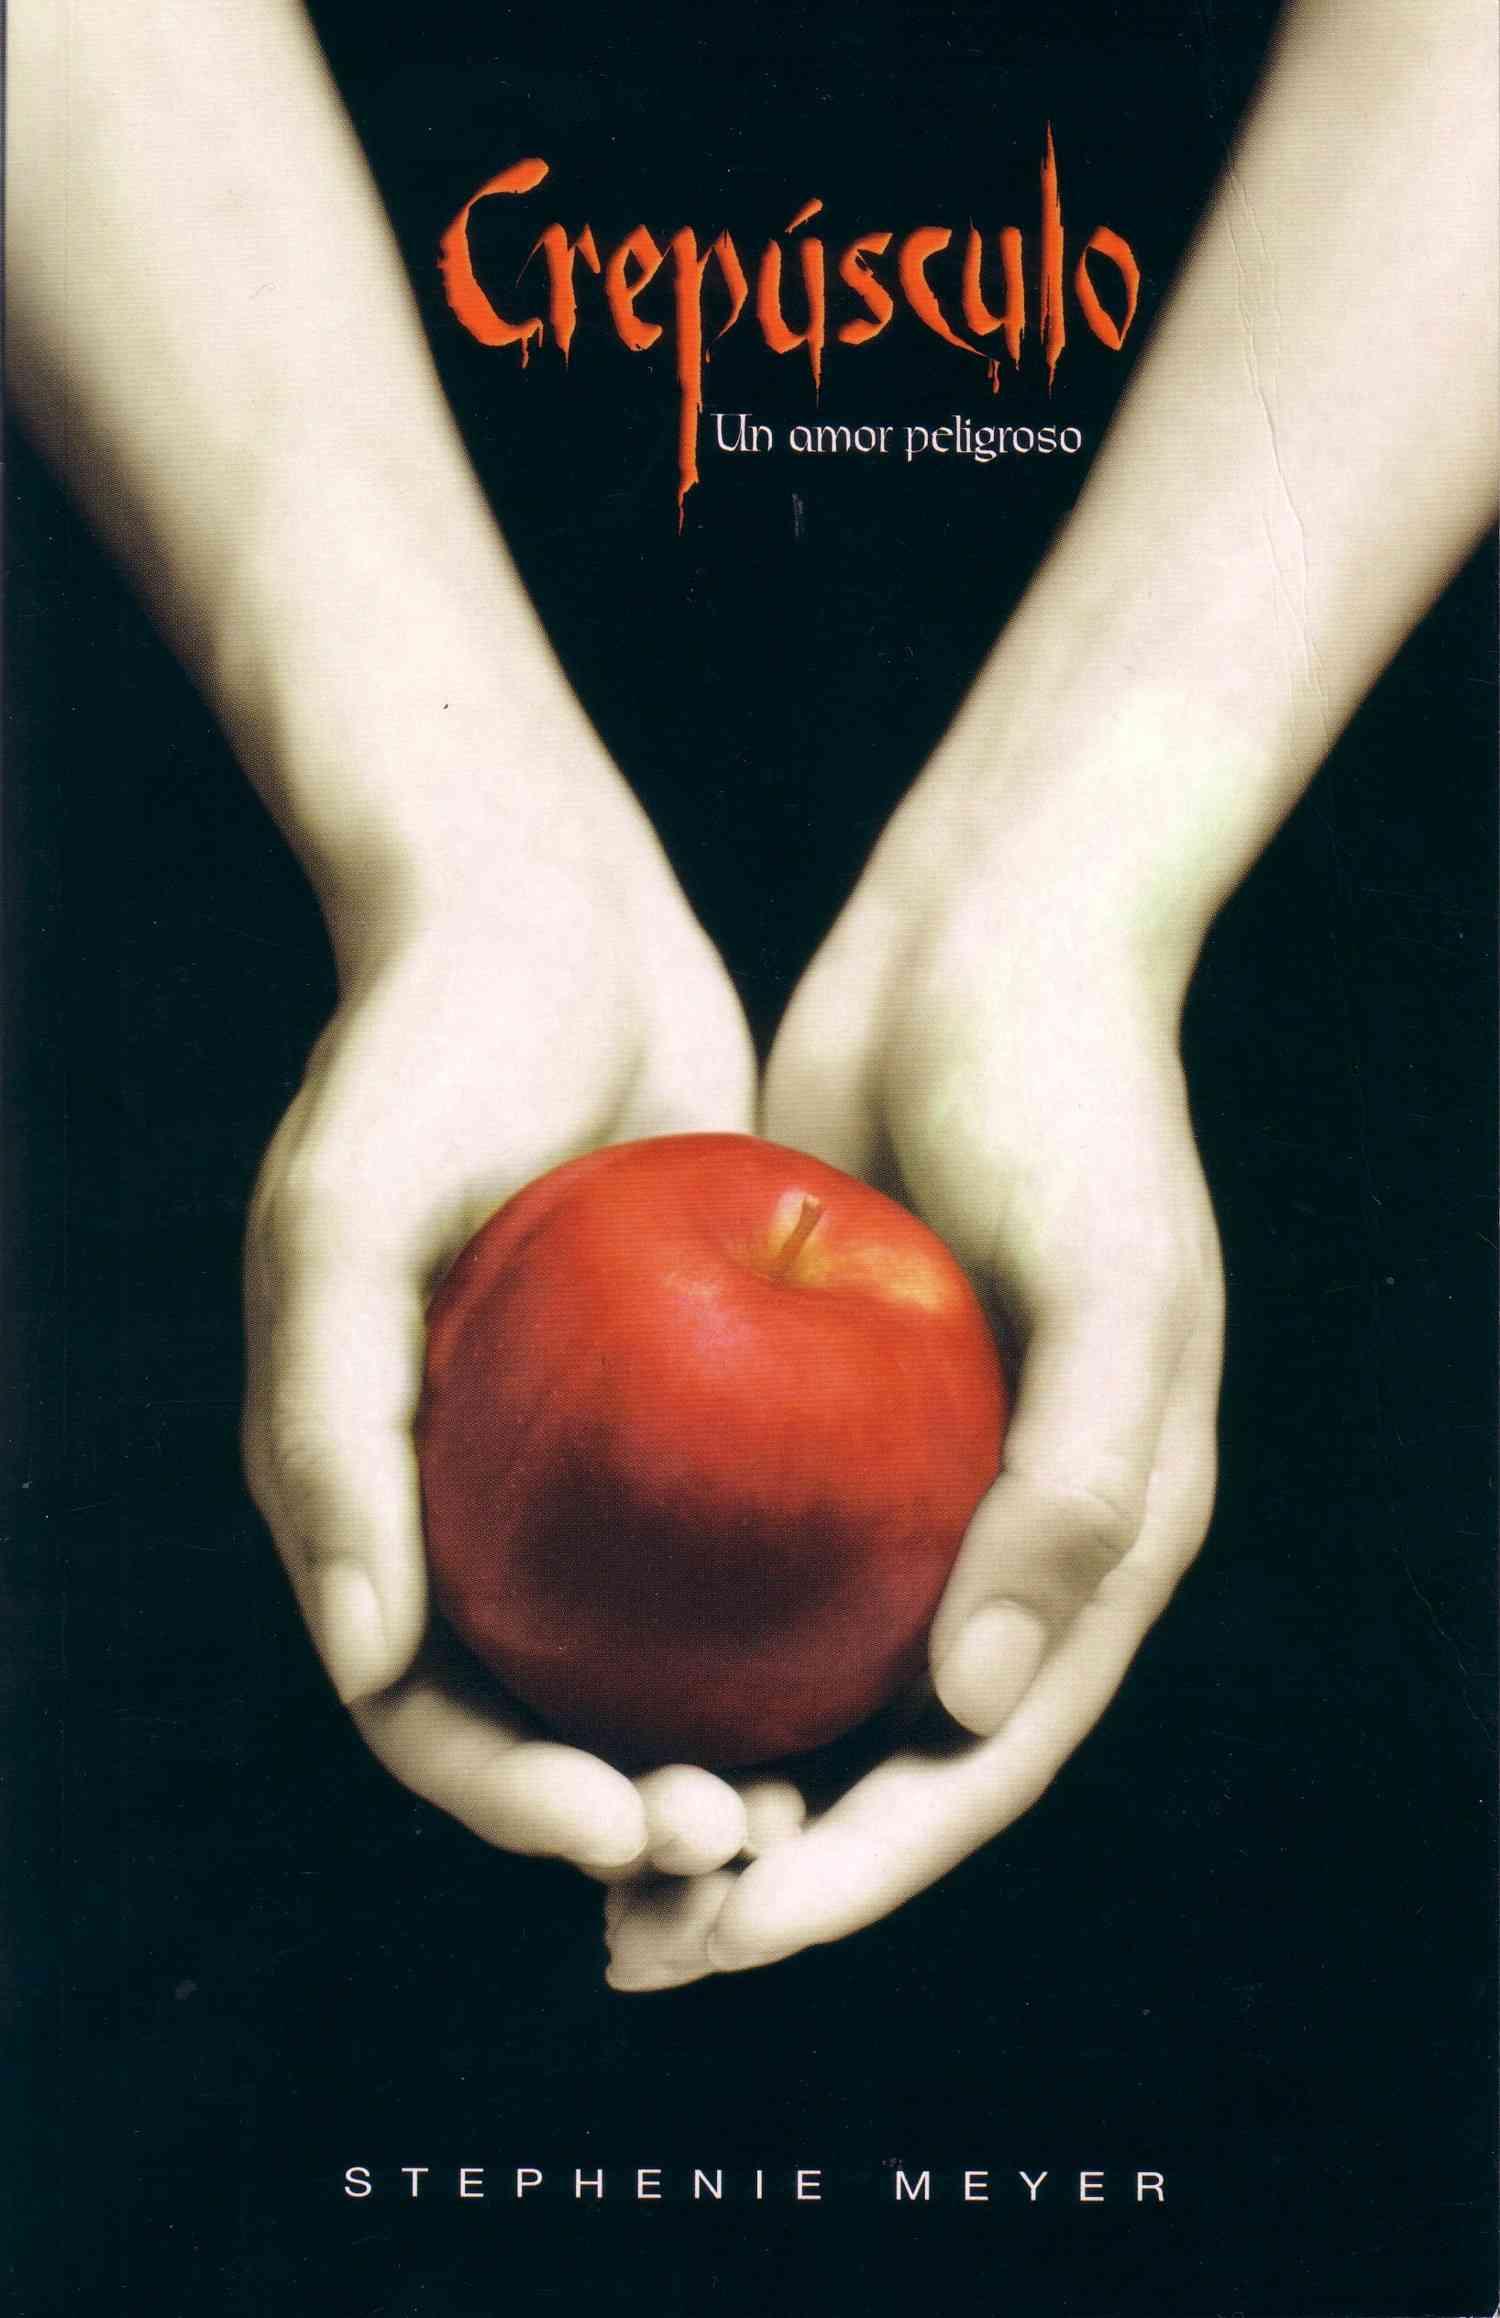 Crepusculo / Twilight: Un Amor Peligroso / A Dangerous Love (Paperback)